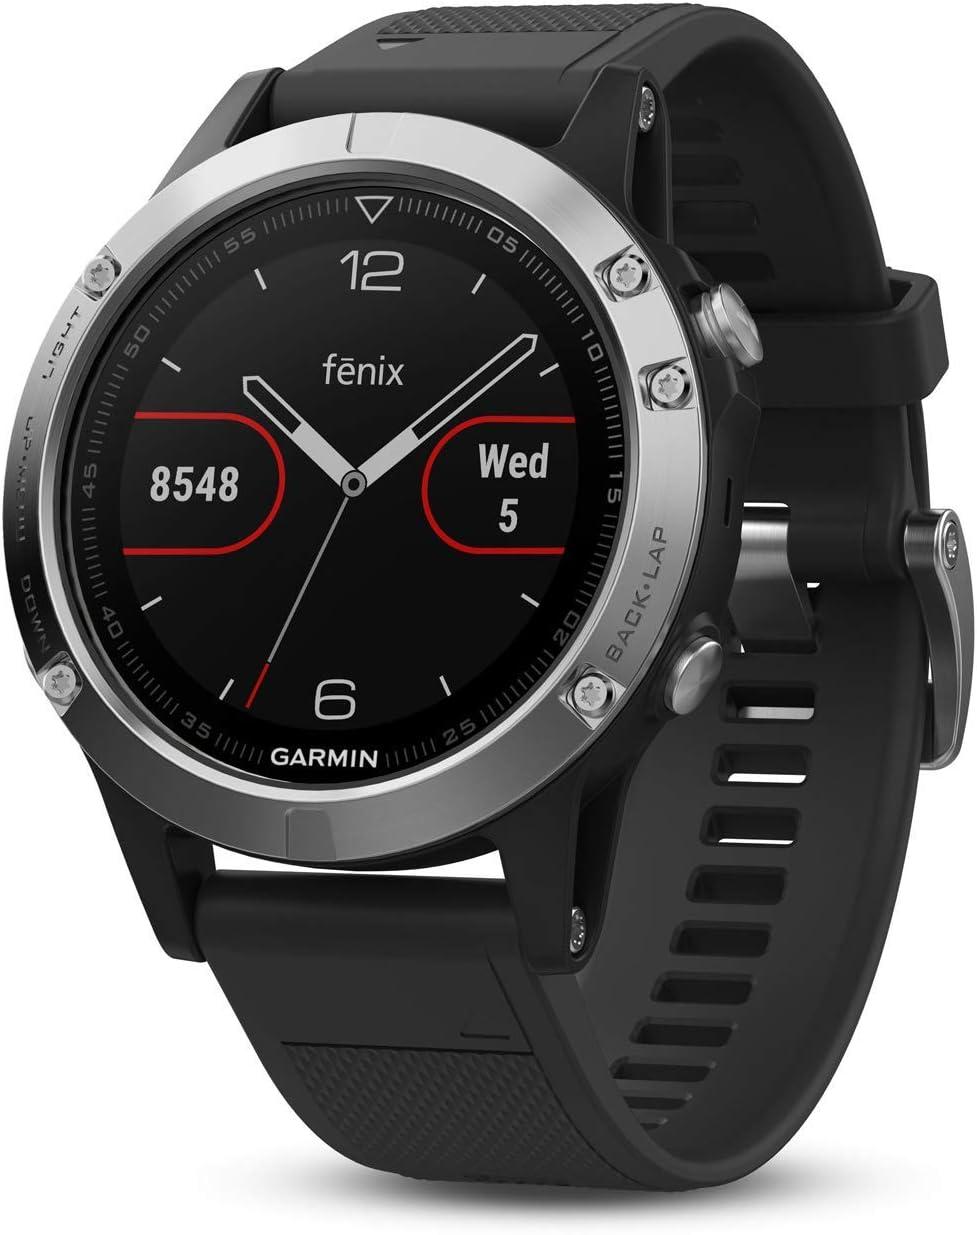 Garmin Fenix 5 Plata con Banda Negra 47 mm Premium Multisport GPS y GLONASS (Reacondicionado)